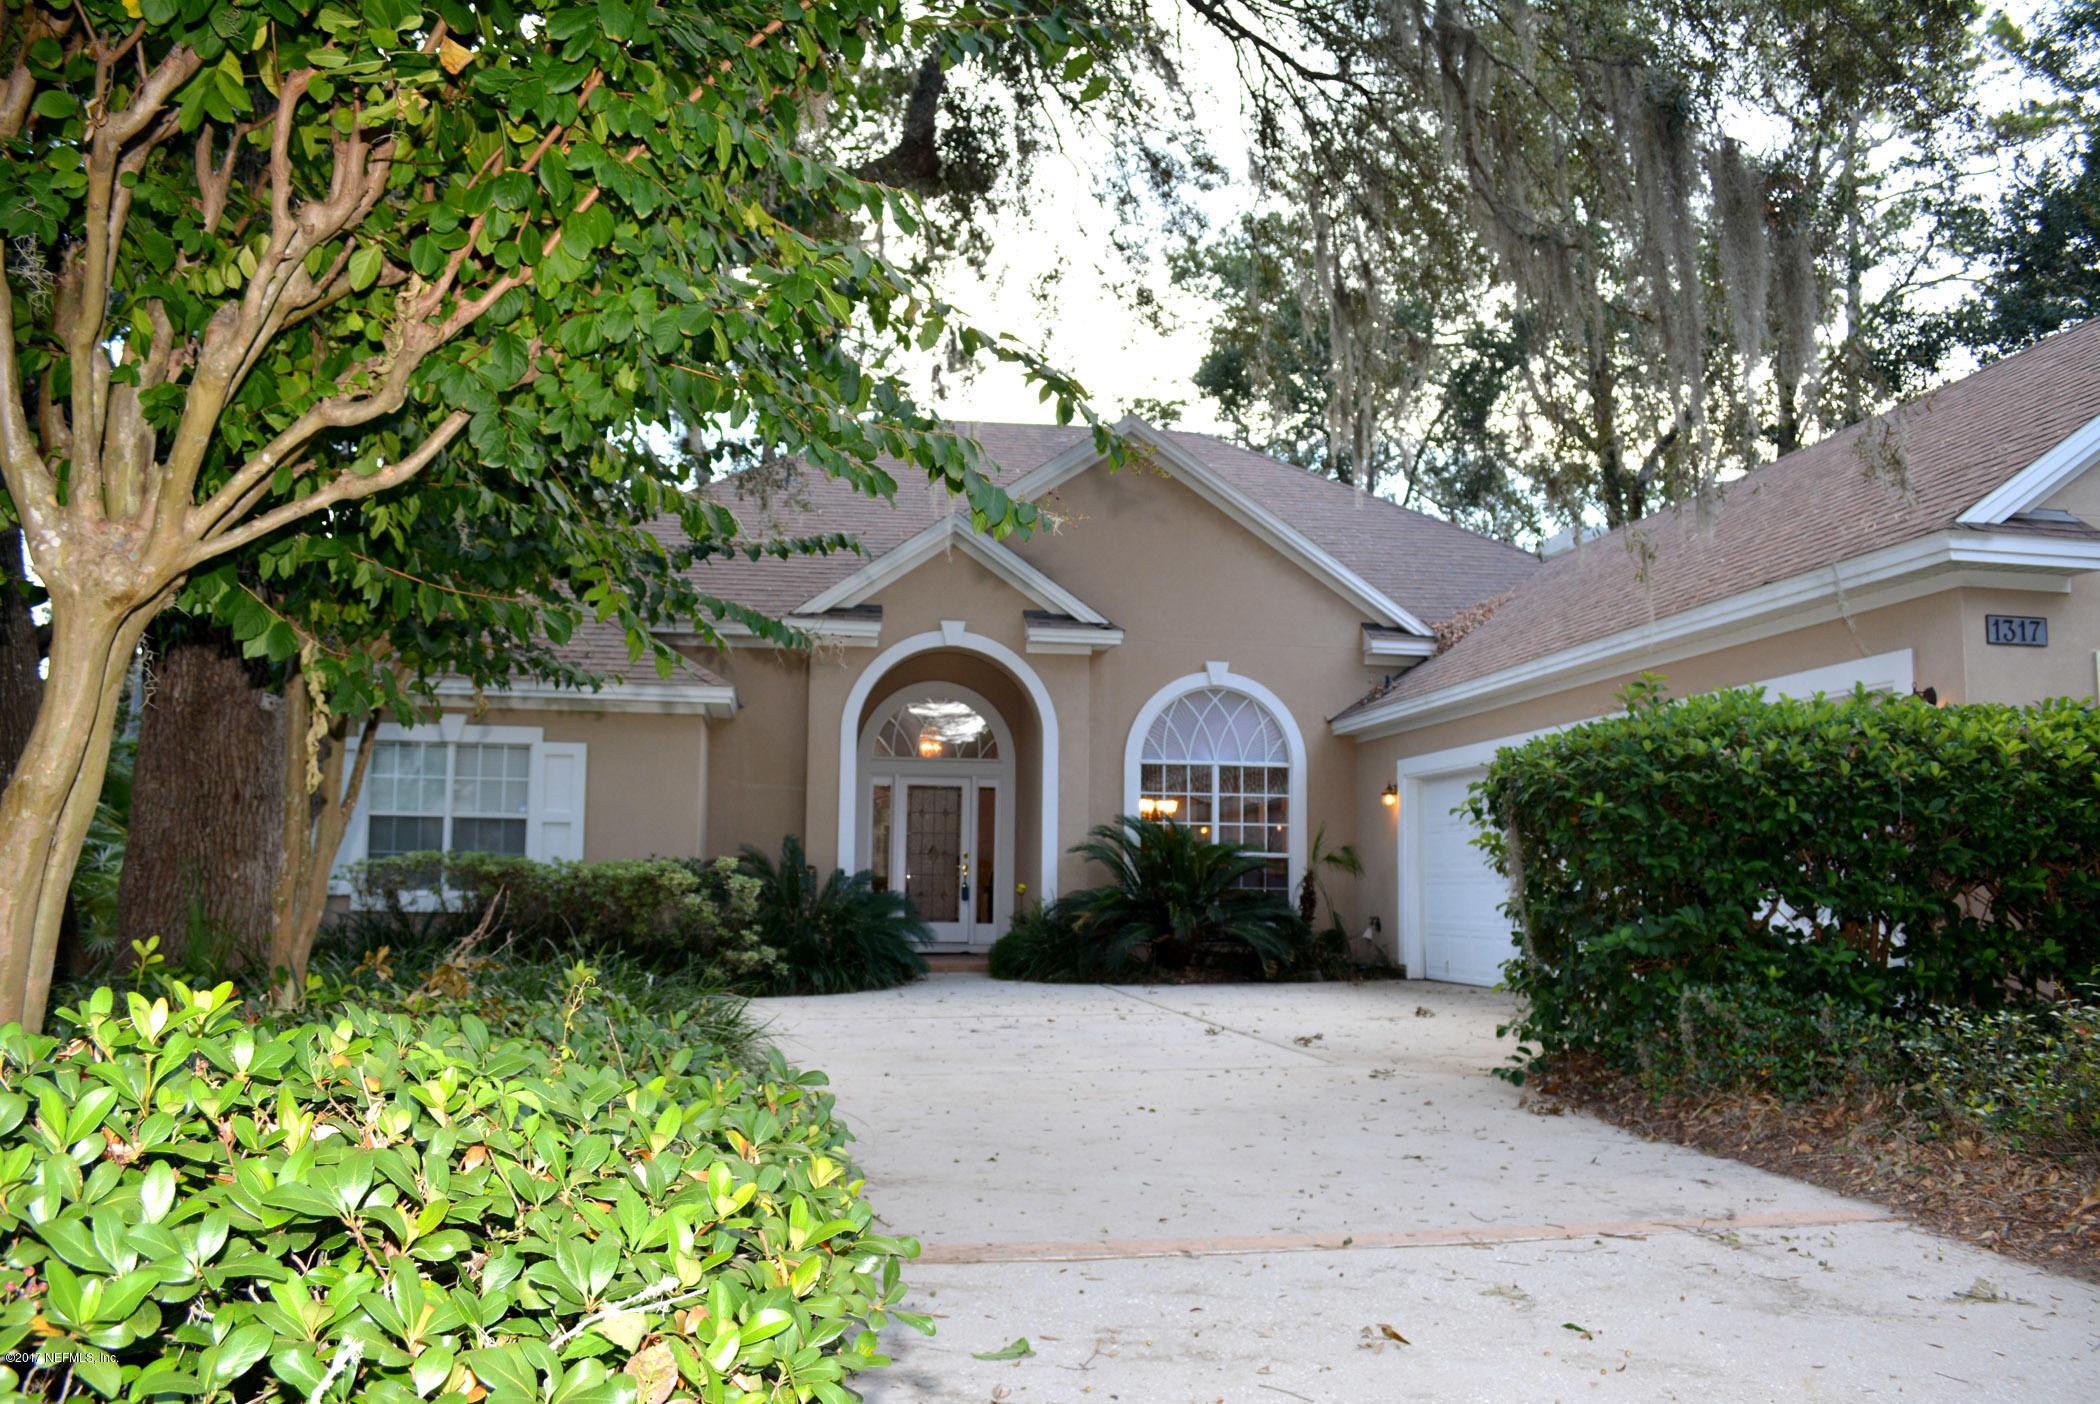 1317 MARSH HARBOR, JACKSONVILLE, FLORIDA 32225, 5 Bedrooms Bedrooms, ,4 BathroomsBathrooms,Residential - single family,For sale,MARSH HARBOR,902183